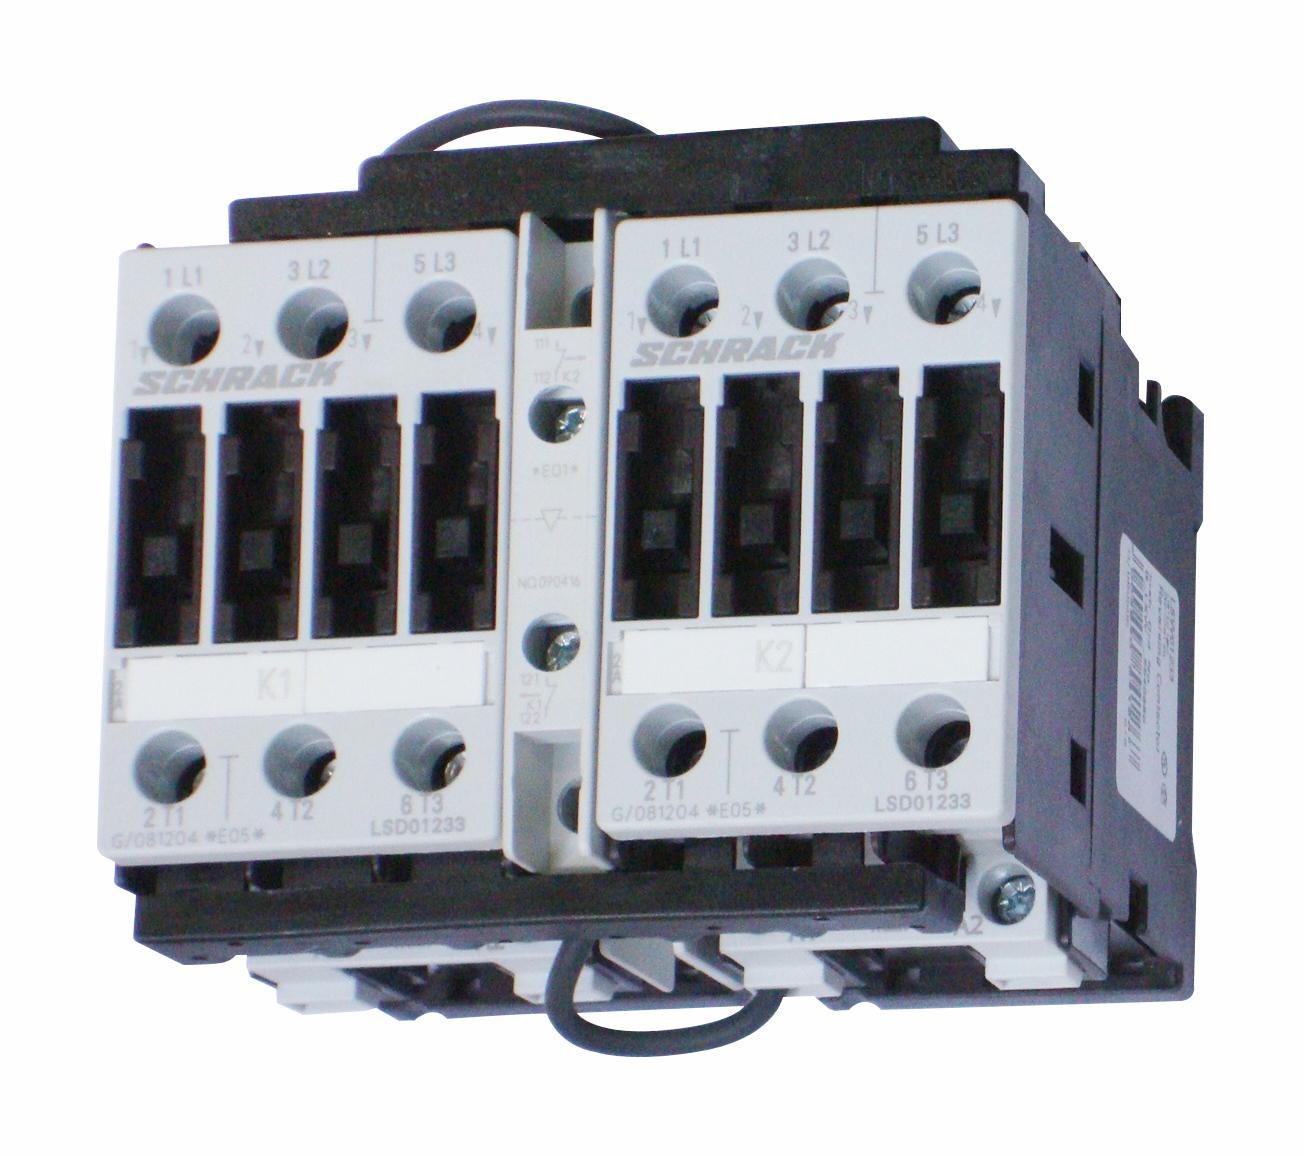 1 Stk Wendeschützkombination, 5,5kW, 12A AC3, 230VAC, 0 LSW01233--